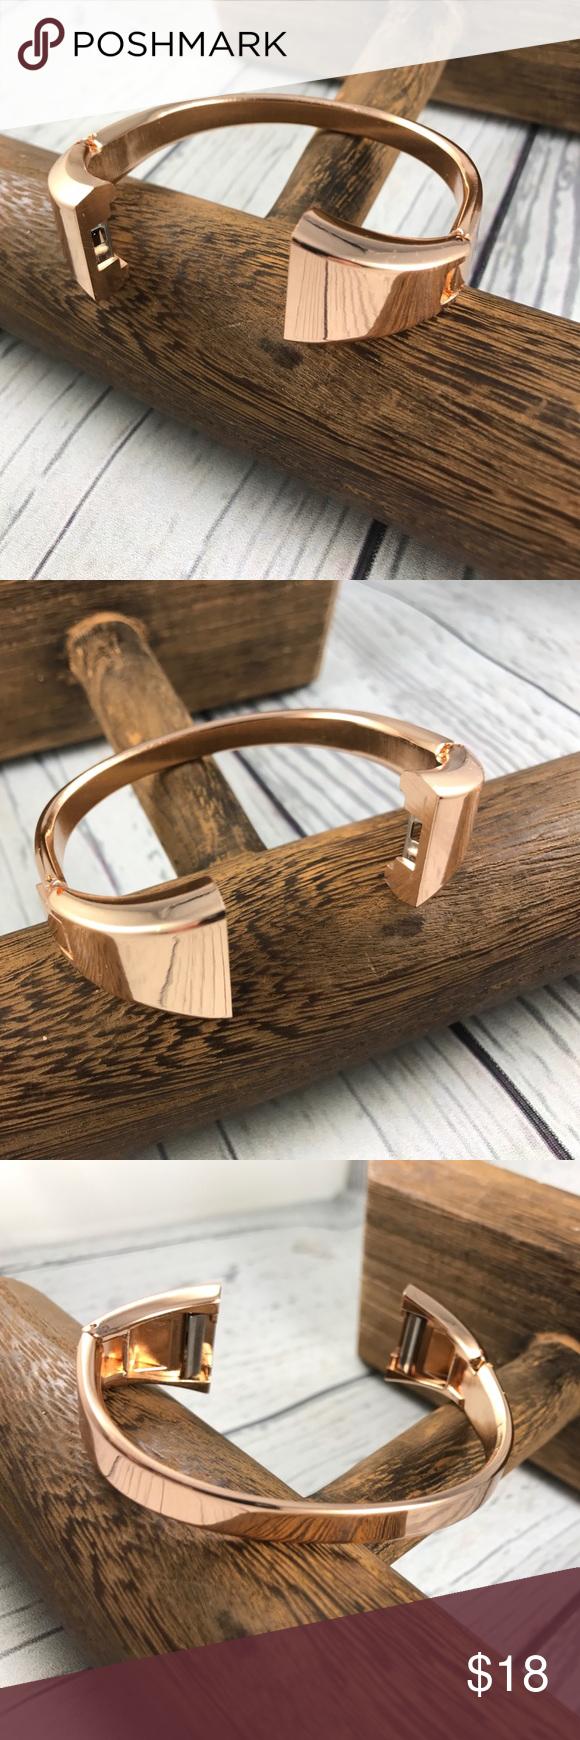 Rose gold fitbit charge bangle bracelet band my posh picks